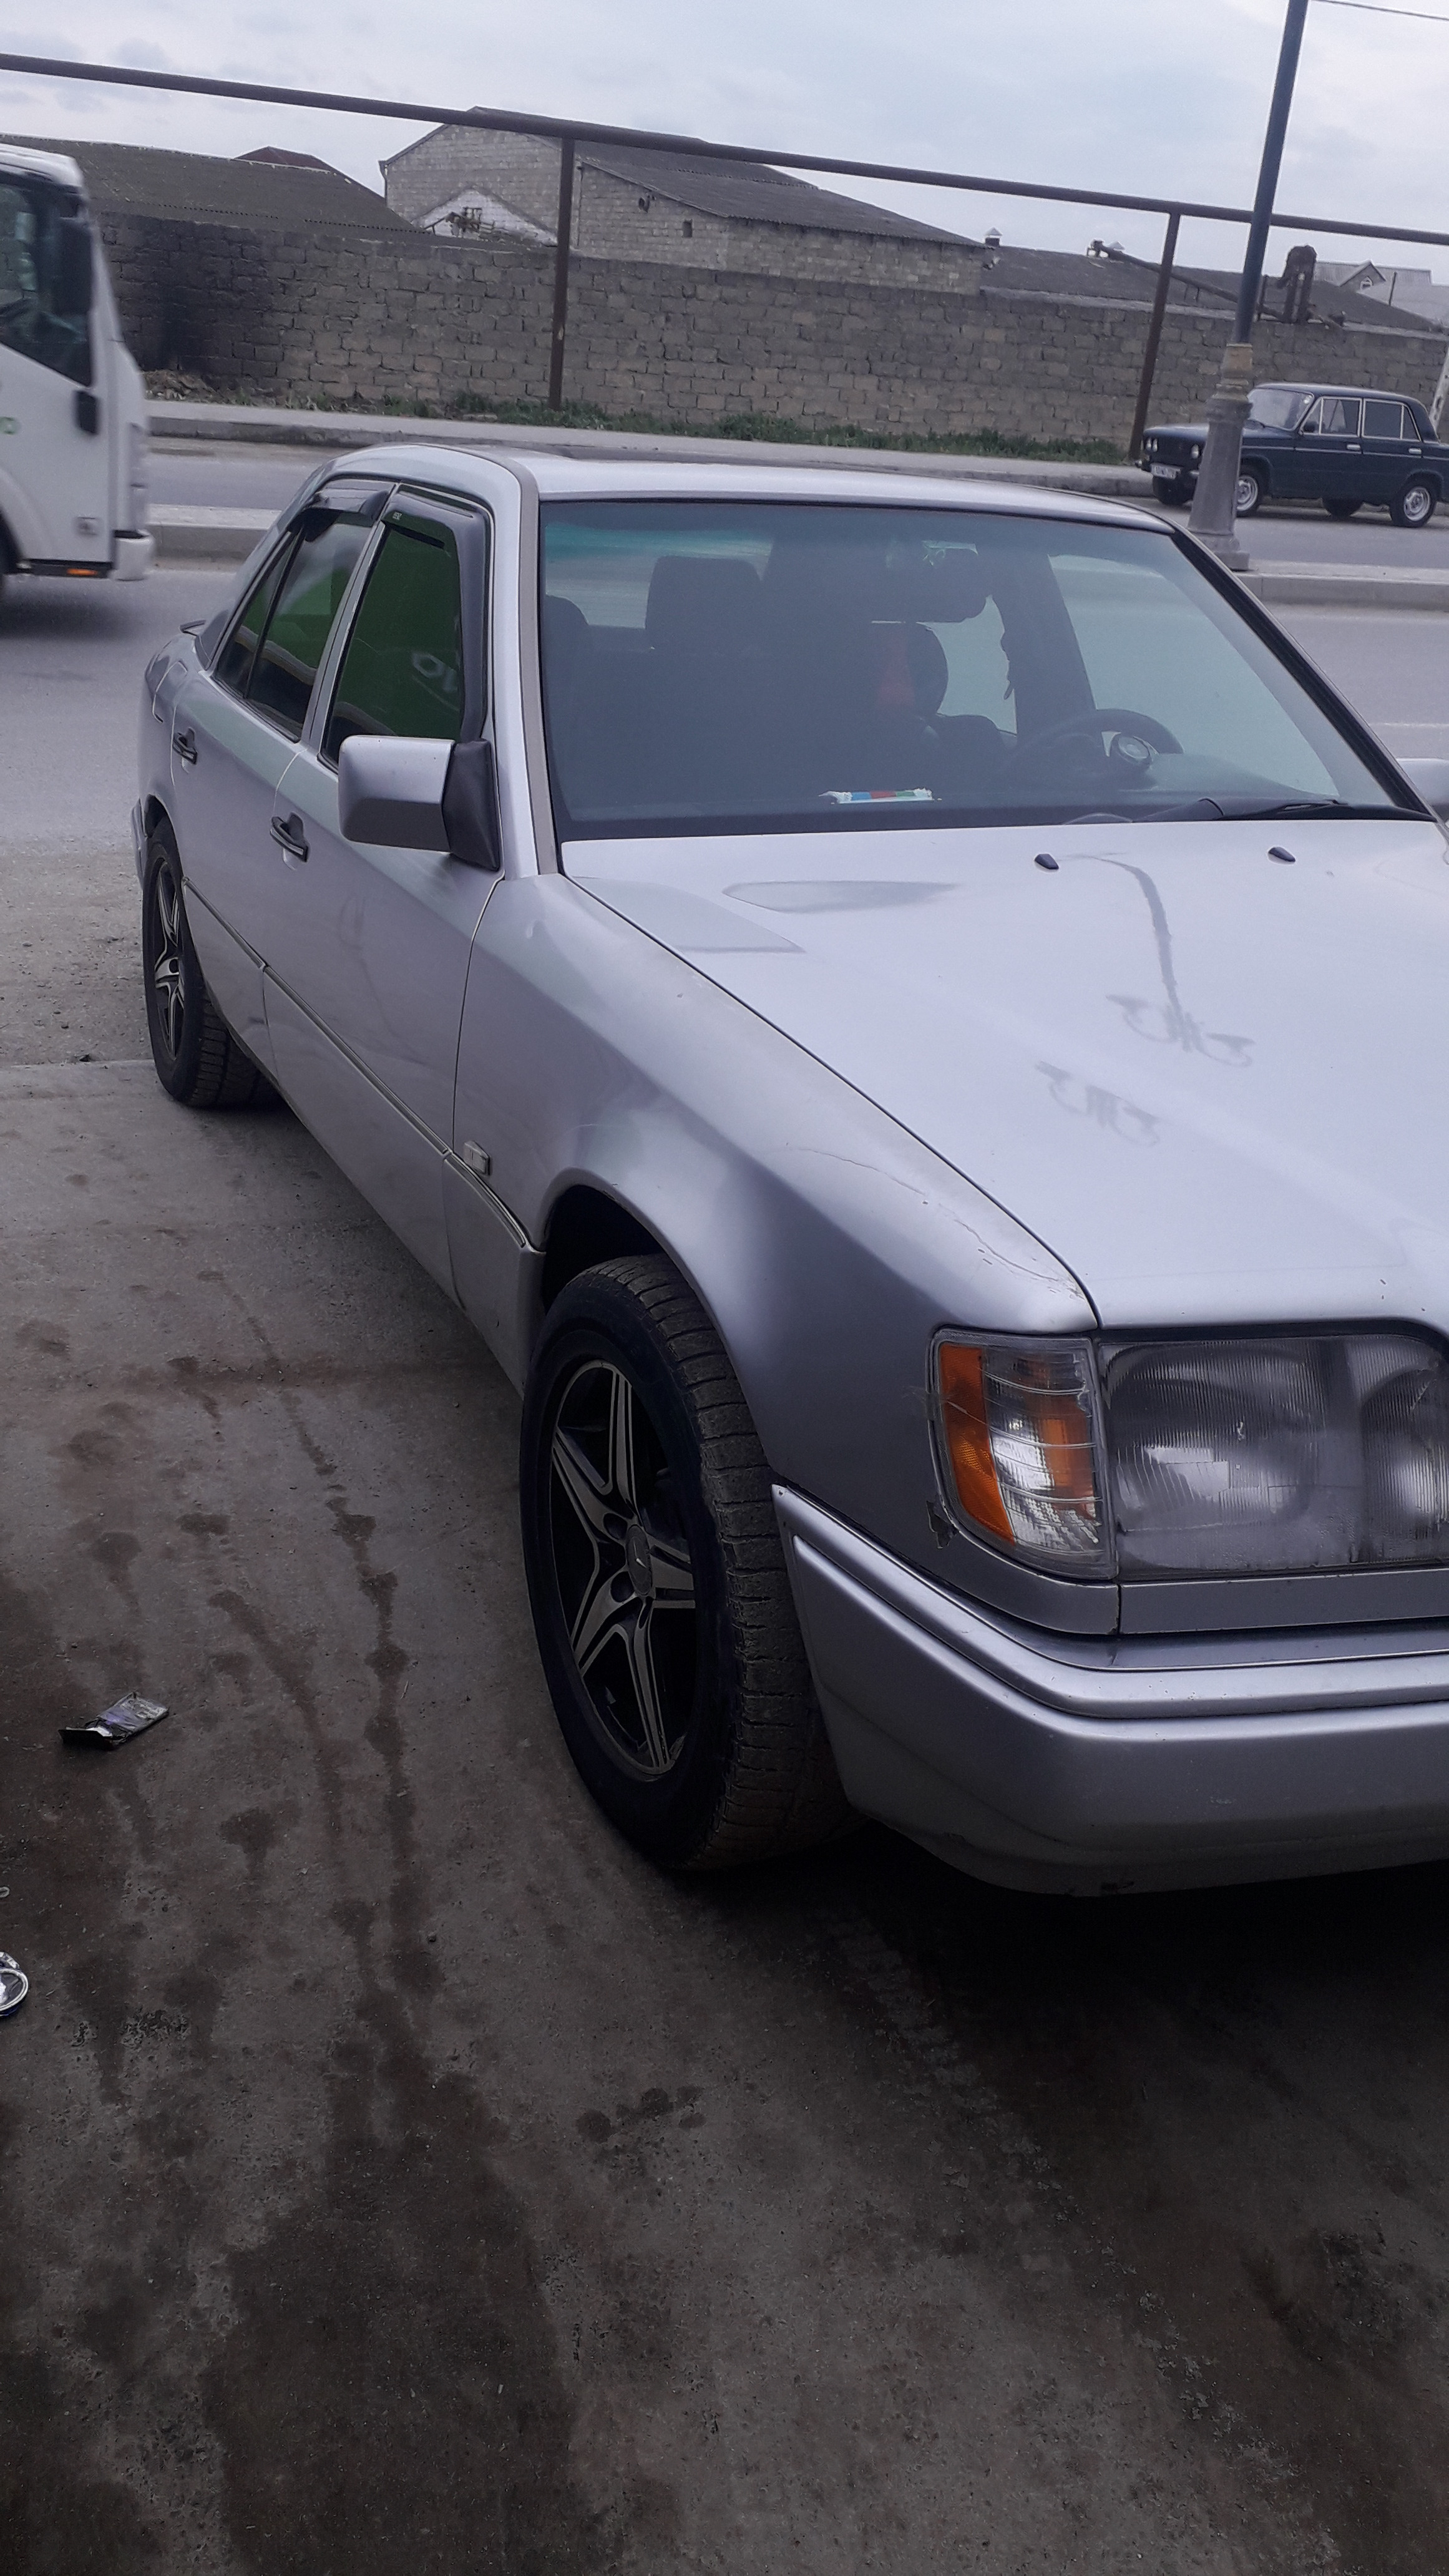 Mercedes-Benz E 220 2.2(lt) 1995 İkinci əl  $8800